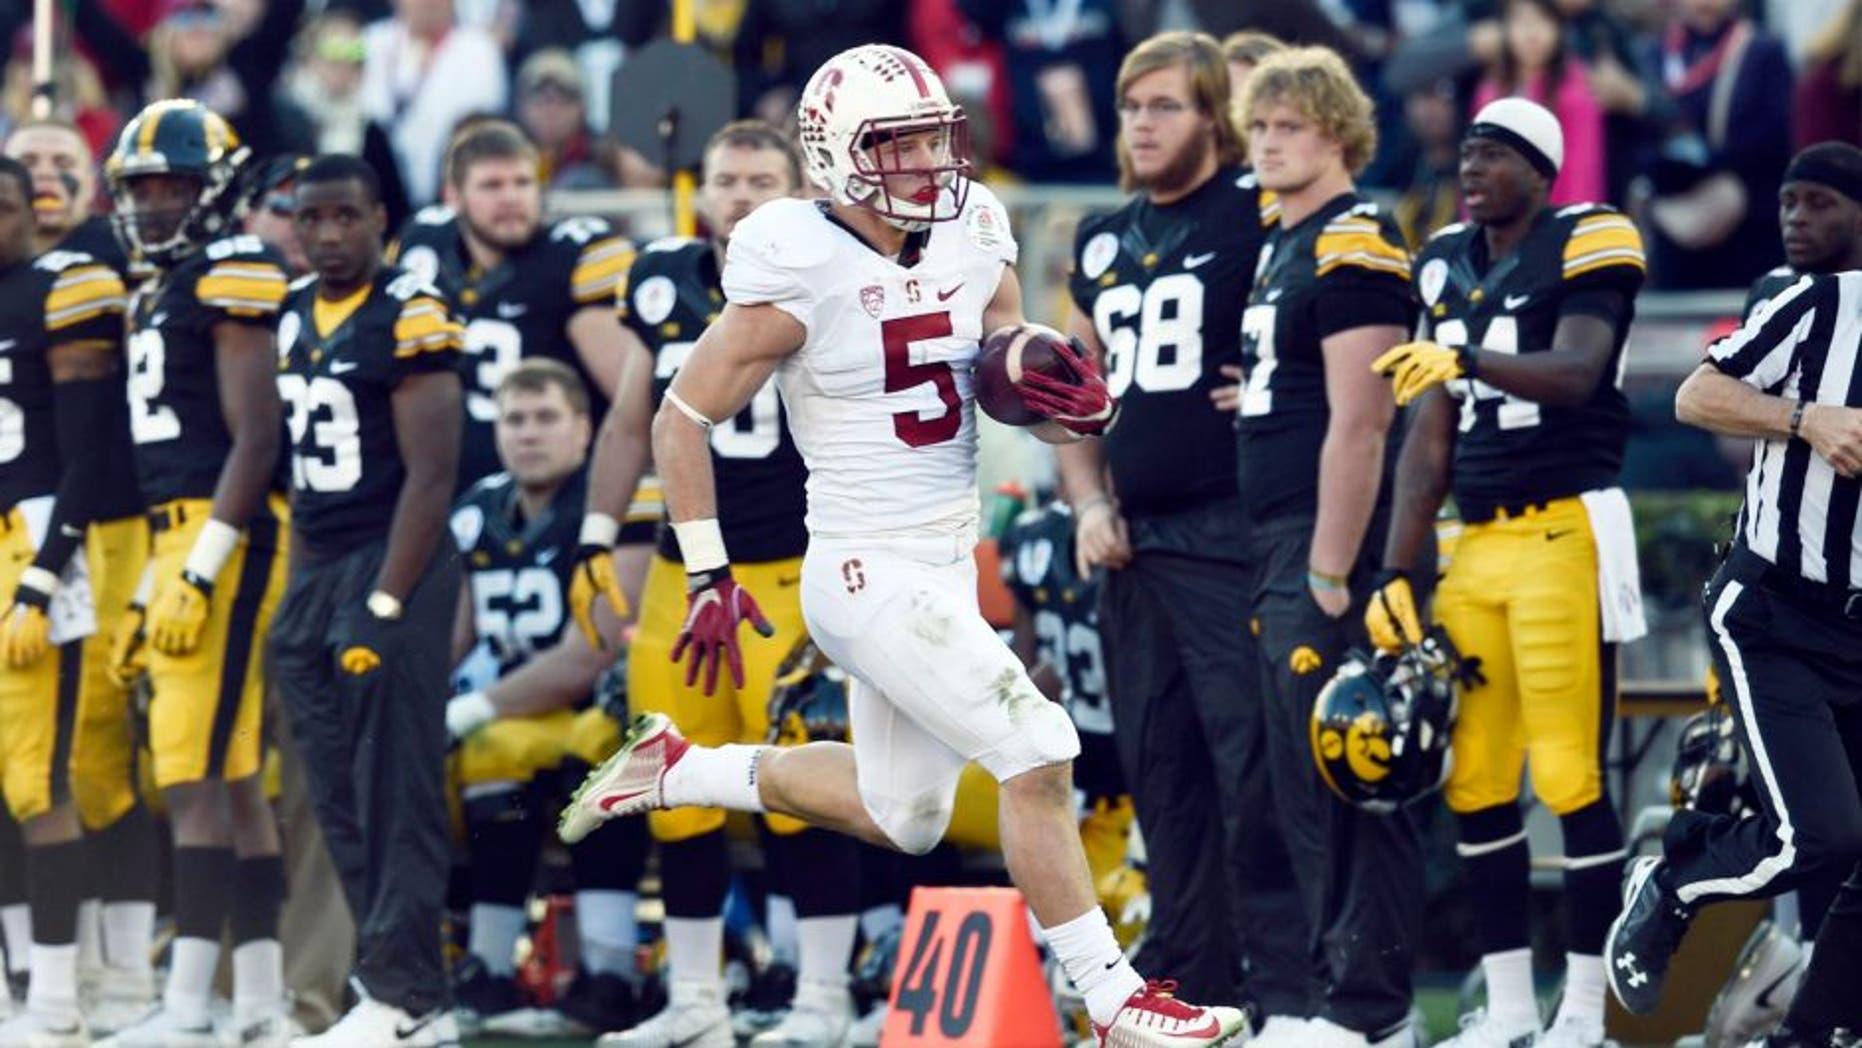 Jan 1, 2016; Pasadena, CA, USA; Stanford Cardinal running back Christian McCaffrey (5) runs against the Iowa Hawkeyes during the second quarter in the 2016 Rose Bowl at Rose Bowl. Mandatory Credit: Gary Vasquez-USA TODAY Sports